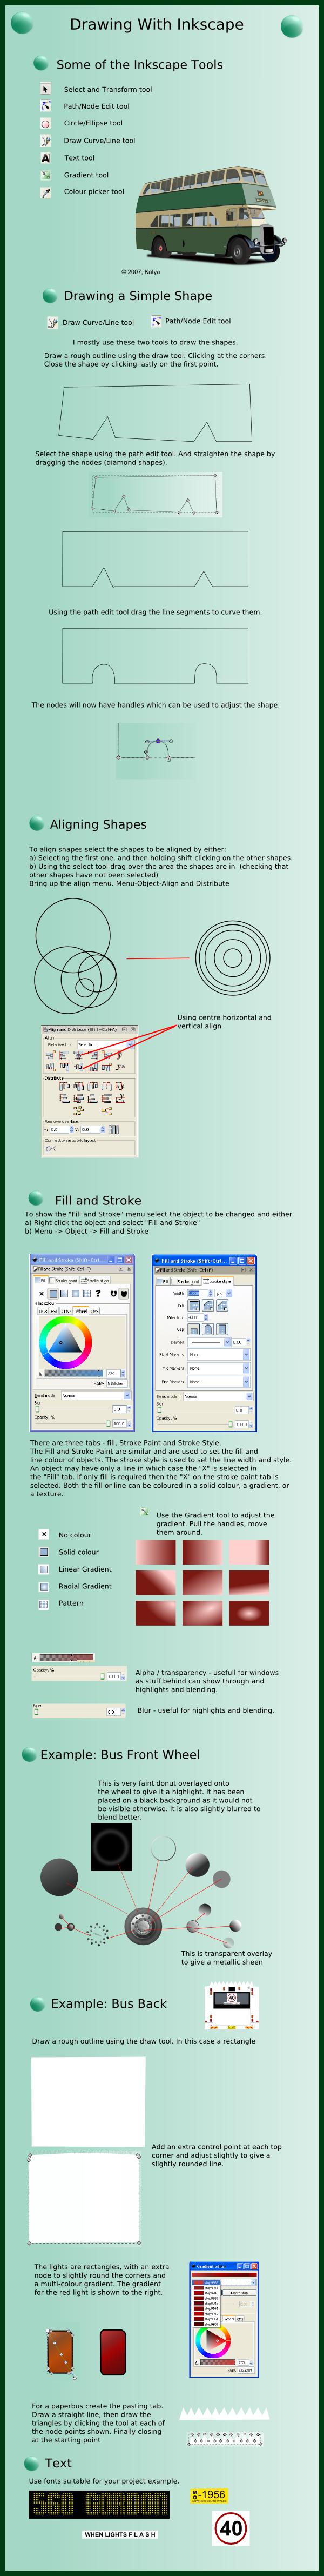 Inkscape Tutorial Part 2 by Belldandy1